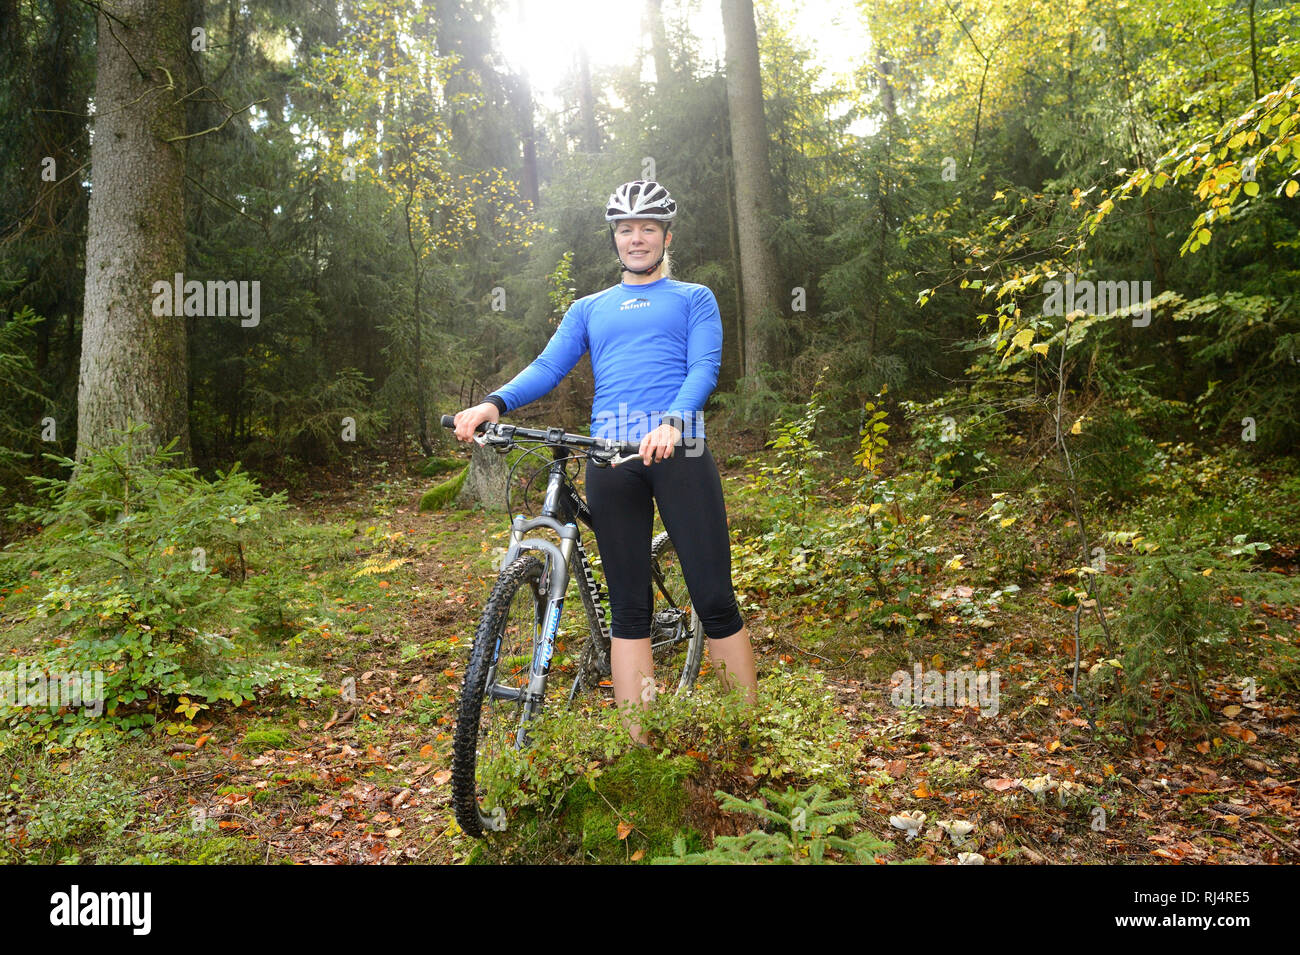 Frau steht mit Mountainbike im Wald, Blick Kamera, - Stock Image